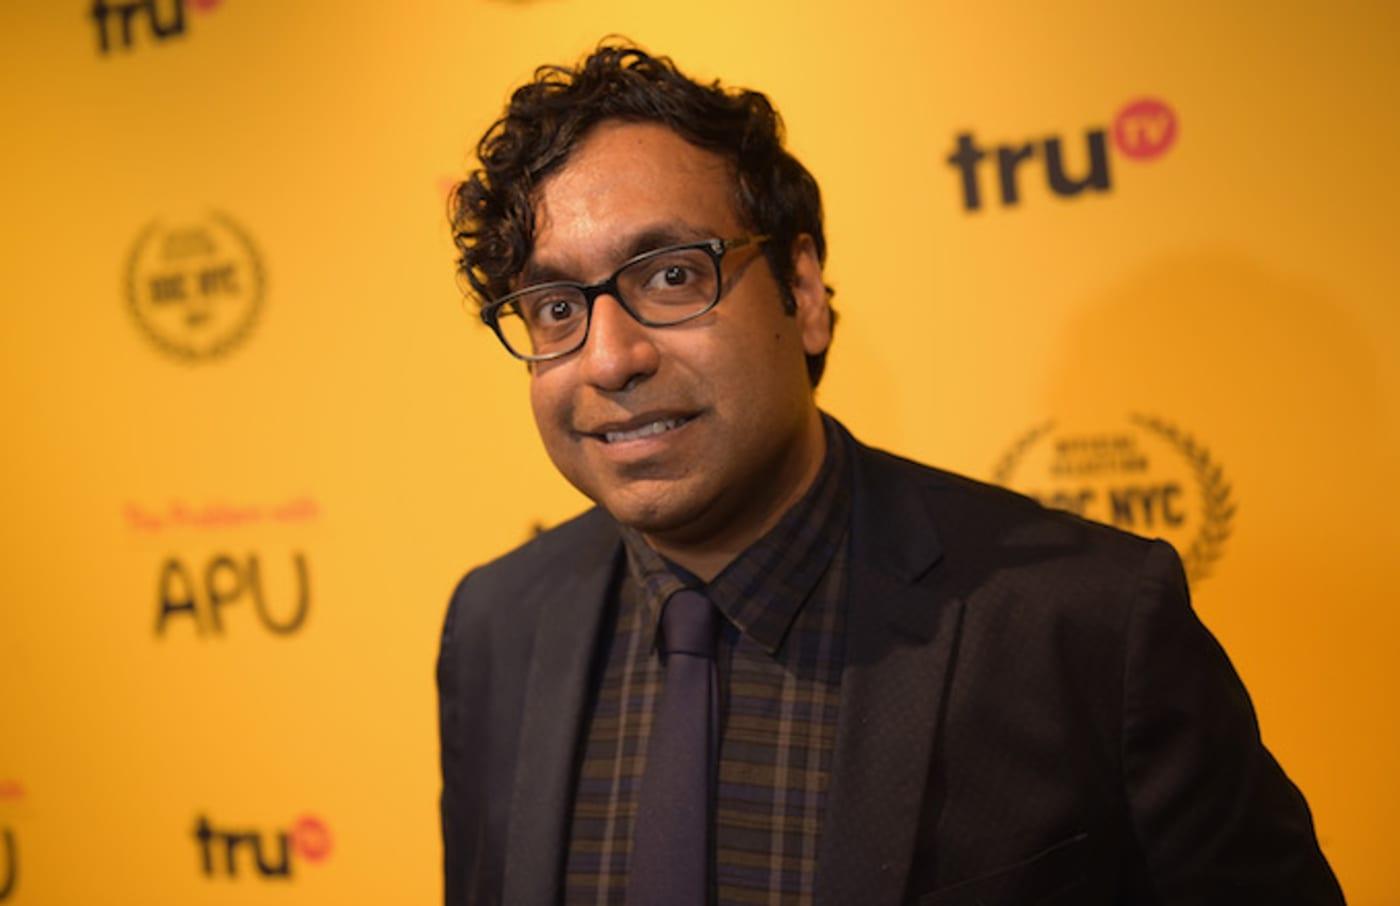 Apu Stereotypes Addressed by Simpsons